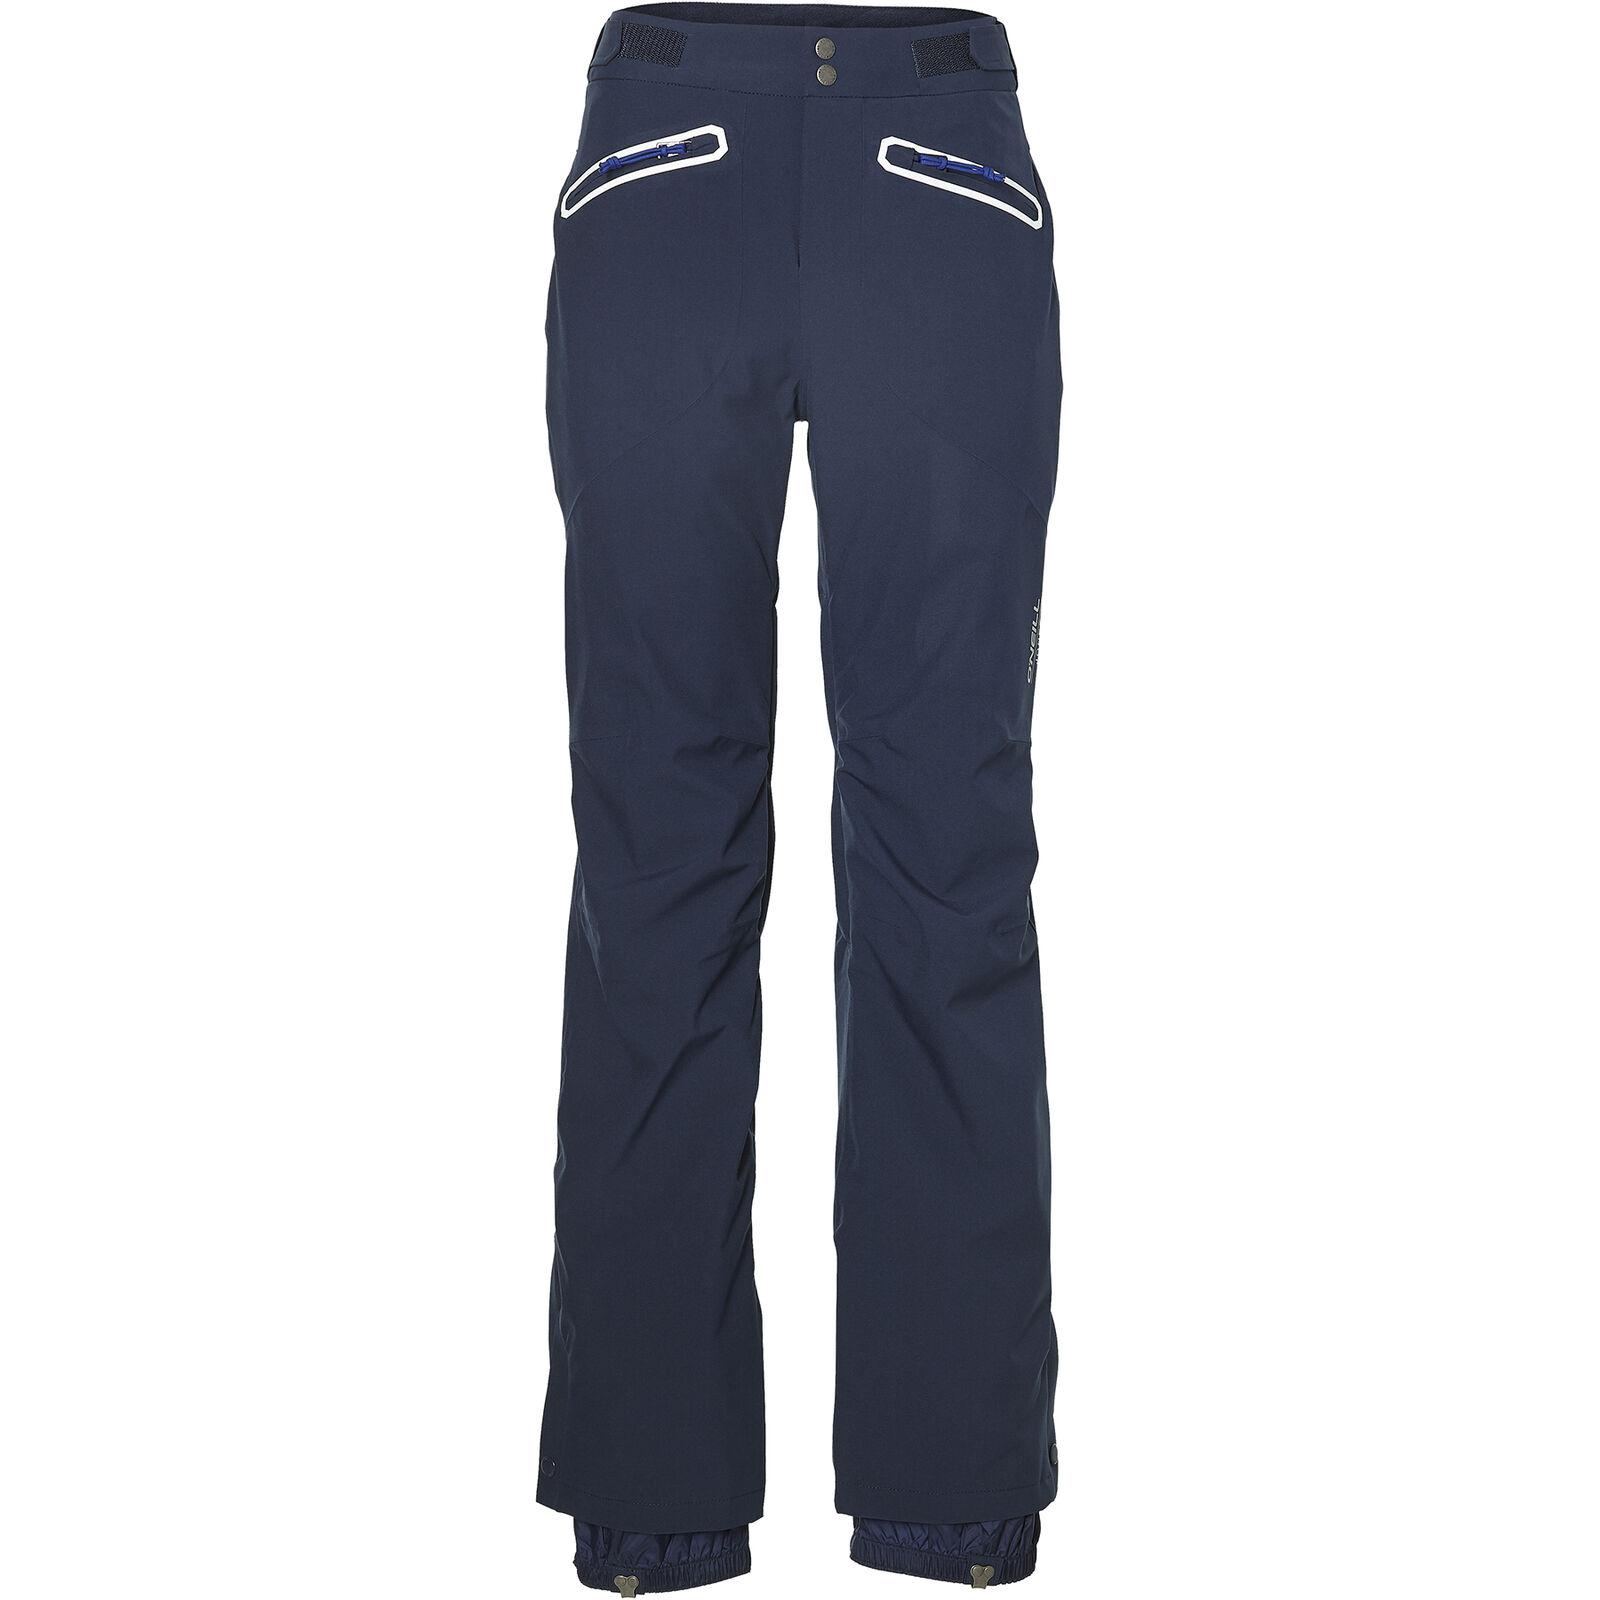 O'Neill Skihose Snowboardhose PW JONES SYNC PANTS dunkelblue elastisch